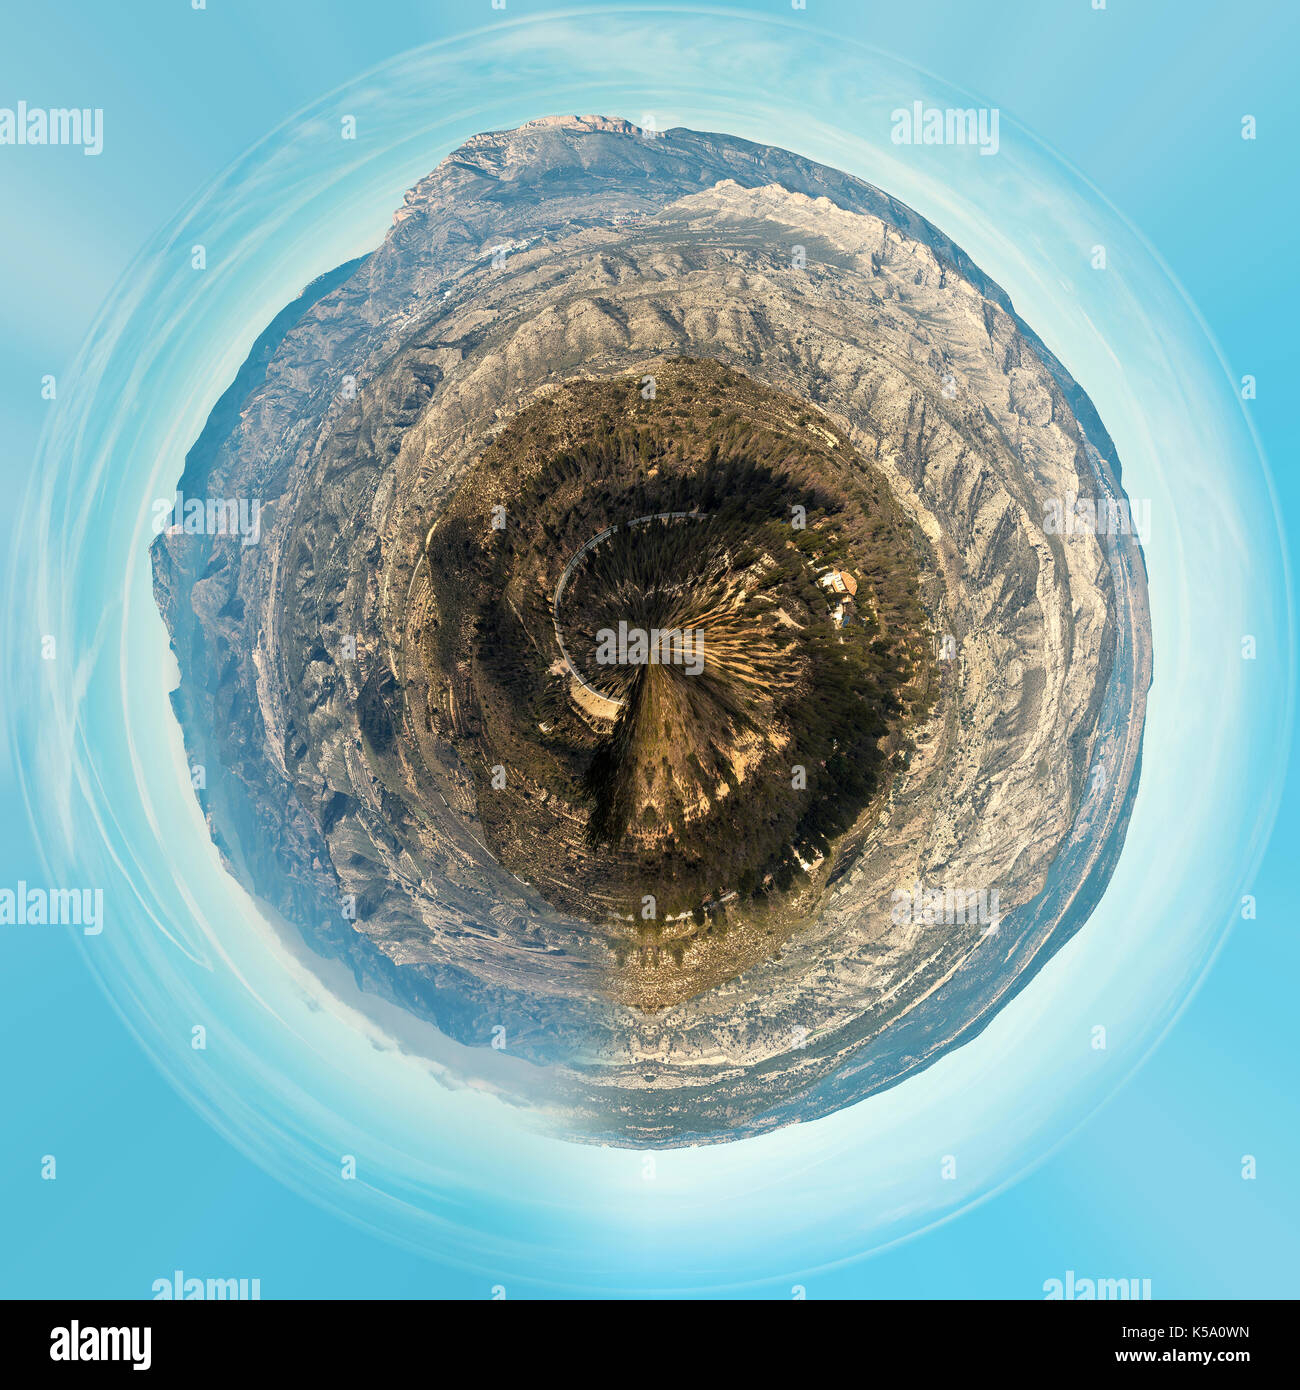 Little planet 360 degree sphere. Panorama of mountain range in Alicante. Costa Blanca, Valencia. Spain - Stock Image